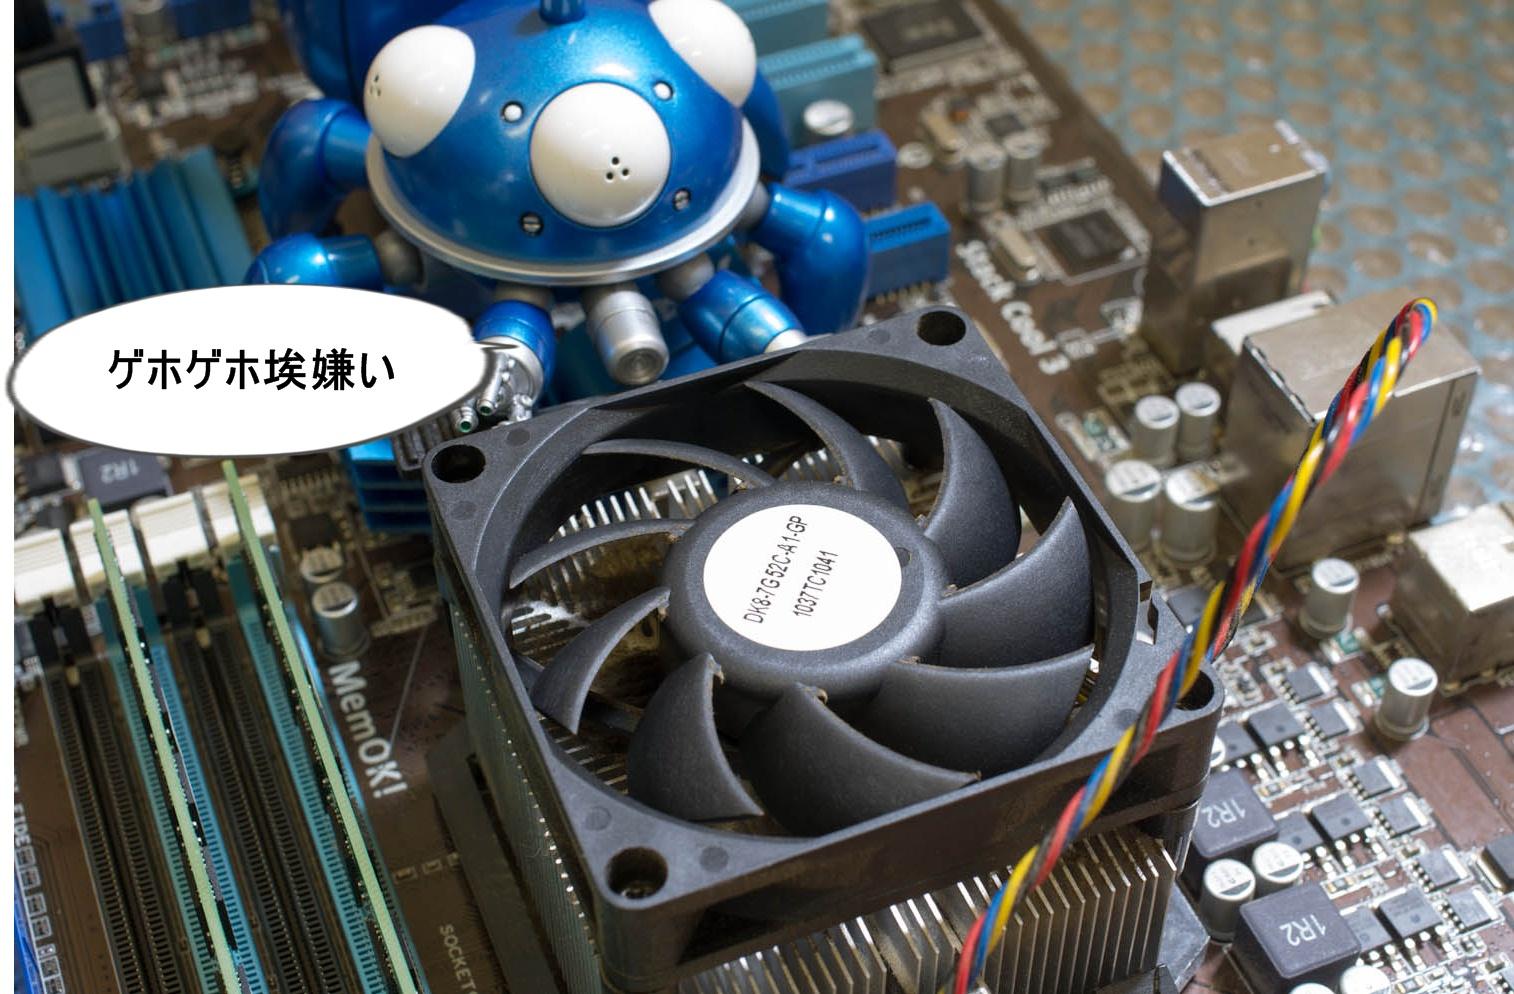 20120902-LSIG4544.jpg